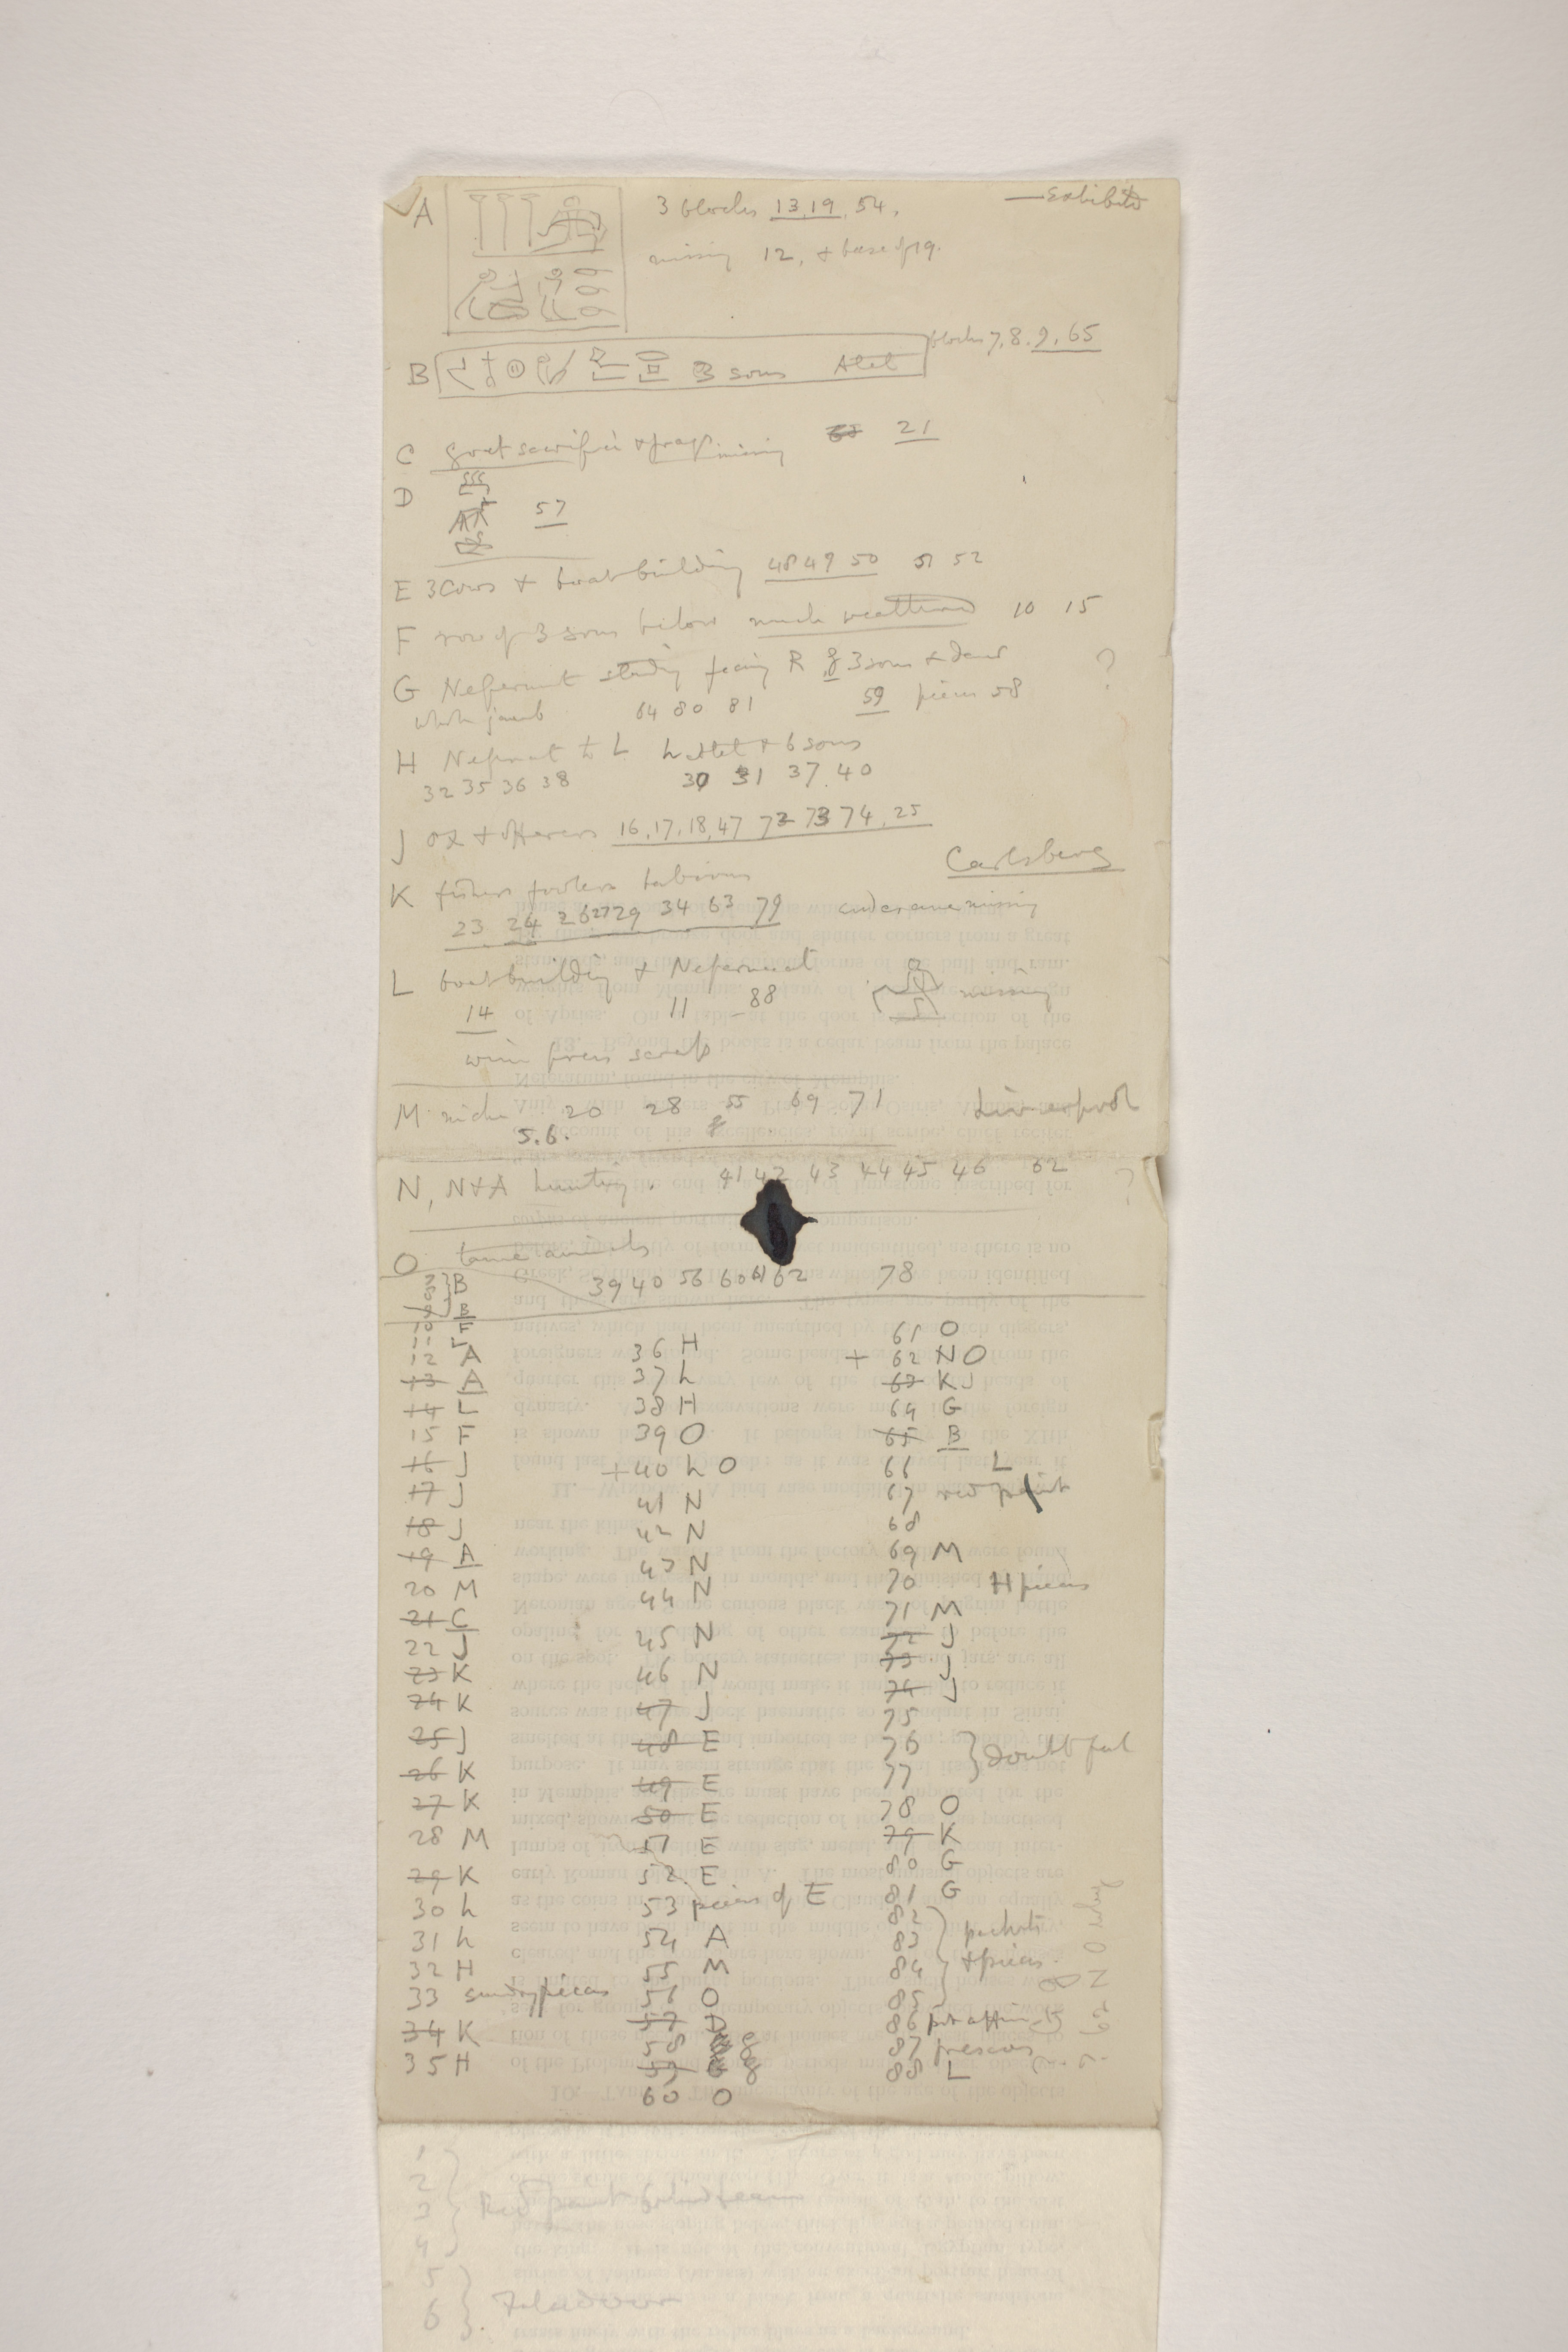 1909-10 Meidum, Memphis Multiple institution list PMA/WFP1/D/18/18.4